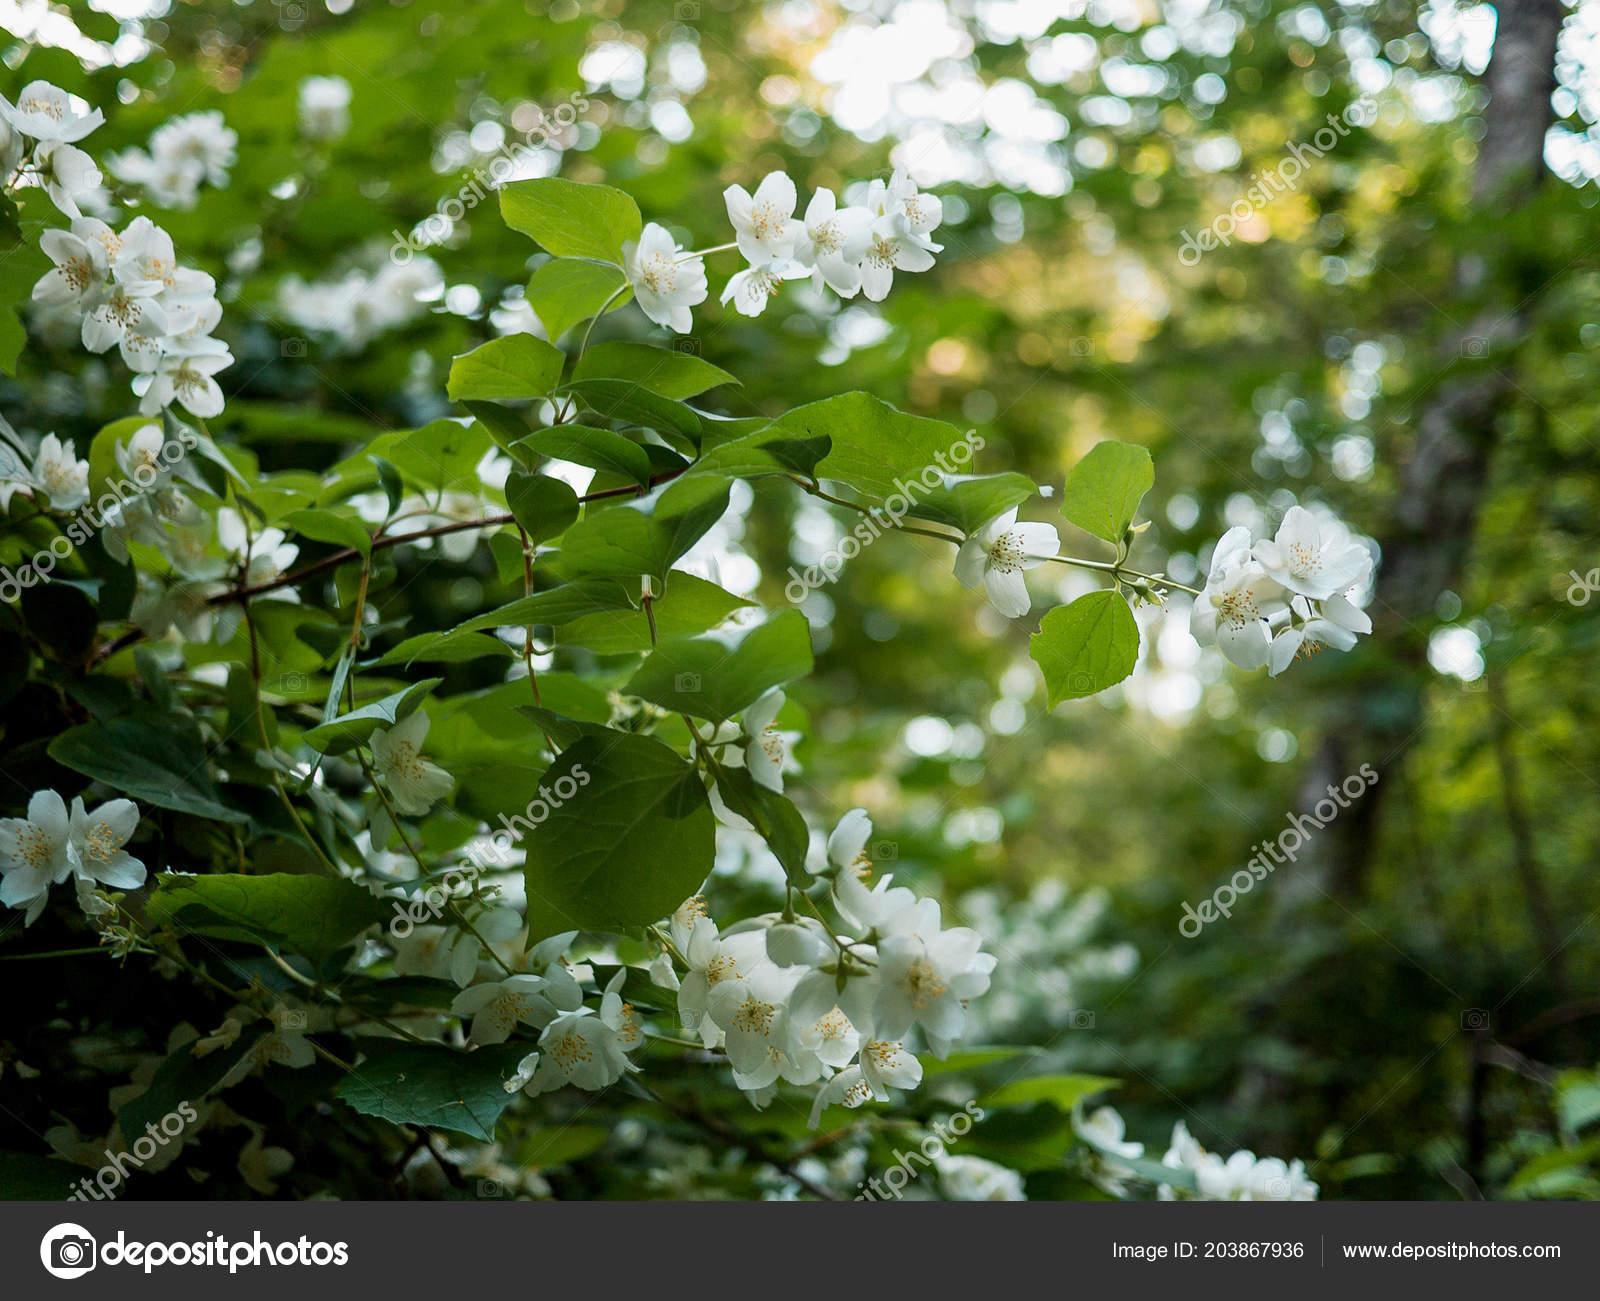 Jasmine Flower Growing Tree Mariyaporshbk 203867936